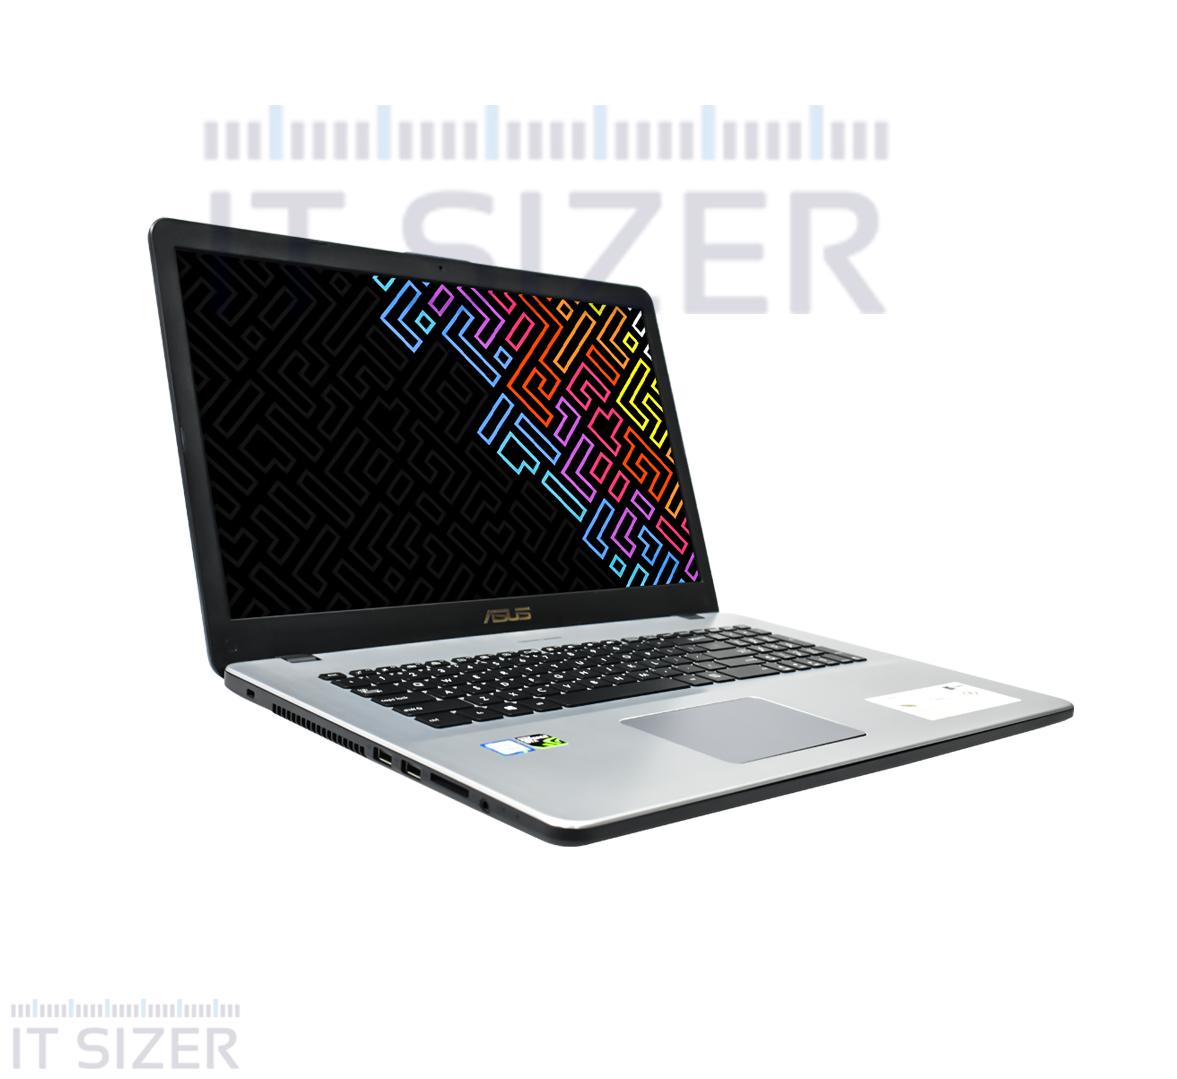 Asus VivoBook Pro 17 Business Laptop, Intel Core i7-8550U CPU, 16GB DDR4 RAM, 1TB SSD , 17 inch Display, Windows 10 Pro (Renewed)